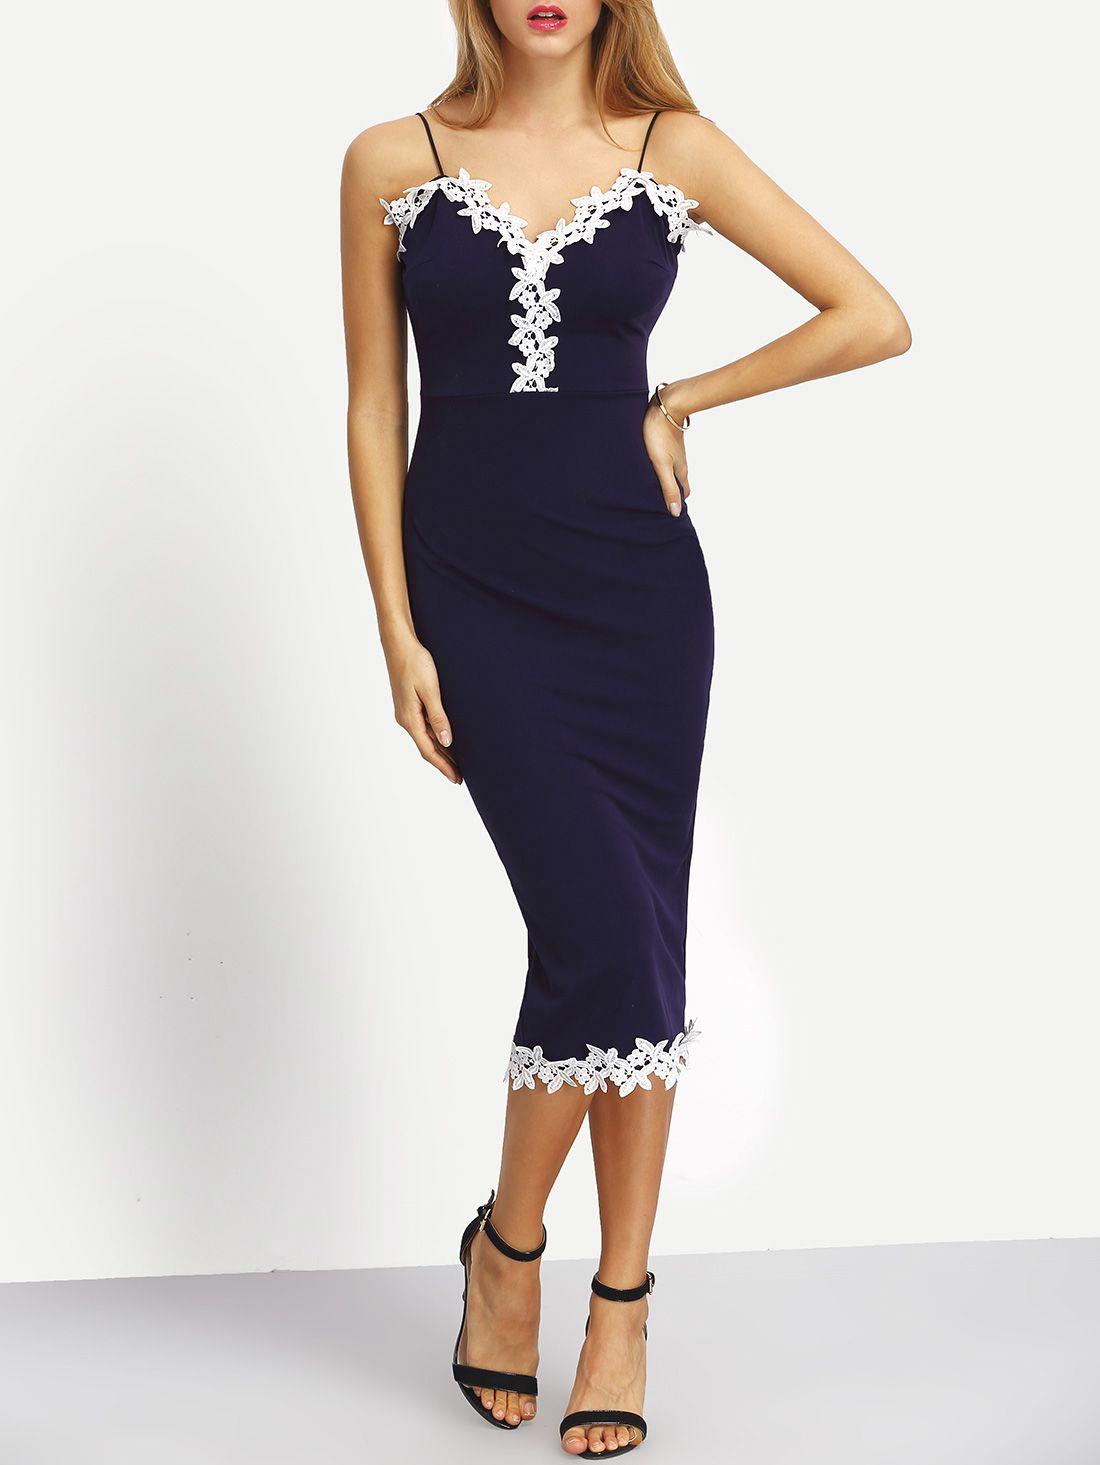 Spaghetti Strap Contrast Lace Split Back Dress -SheIn(Sheinside)